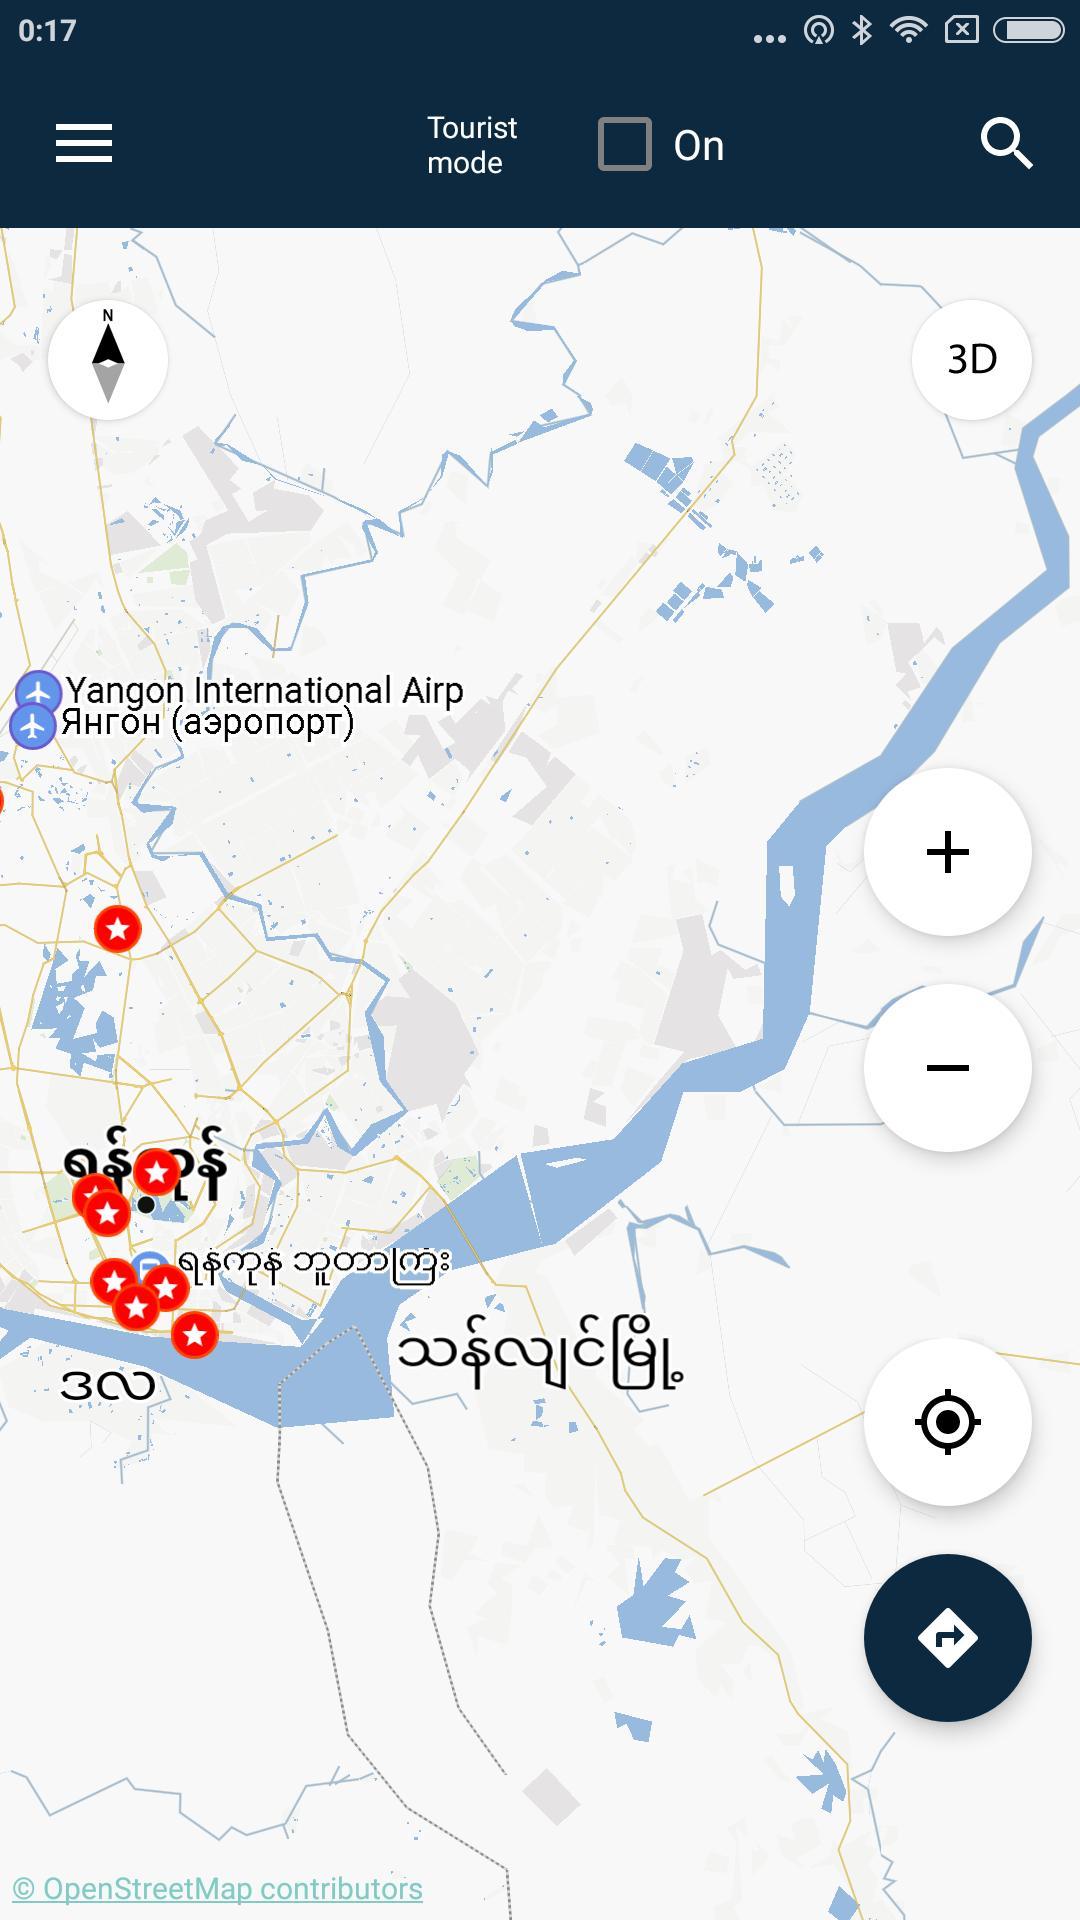 Yangon for Android - APK Download on vientiane map, burma map, taiohae map, hanoi map, hong kong map, bumthang map, phnom penh, ho chi minh city, manila map, rangoon map, mekong river map, siem reap, jakarta map, islamabad map, bandar seri begawan map, great wall of china map, bangkok map, kuala lumpur, murang'a map, aung san suu kyi, burmese language, kuala lumpur map, taipei map, yangtze river map, naypyidaw map, myanmar map,